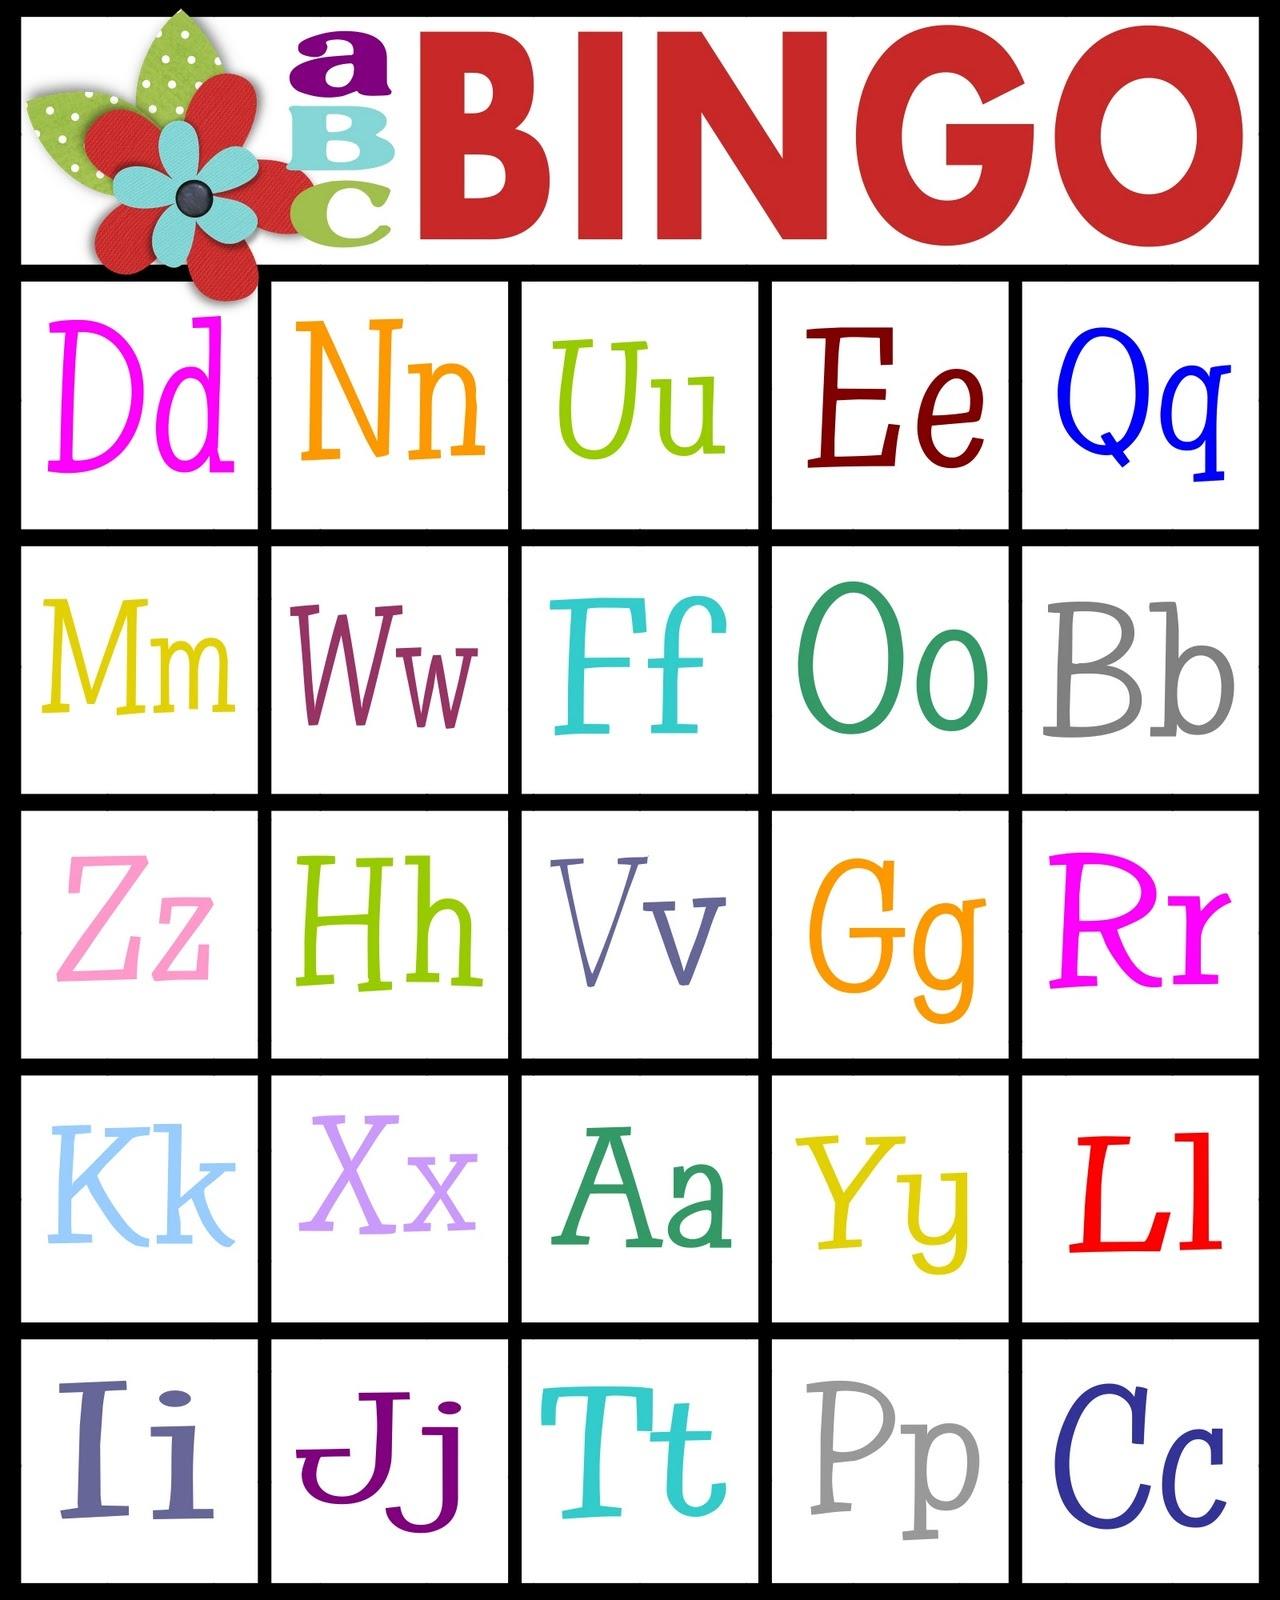 Sassy Sanctuary: Abc's Bingo- Free Printable! - Free Printable Alphabet Bingo Cards